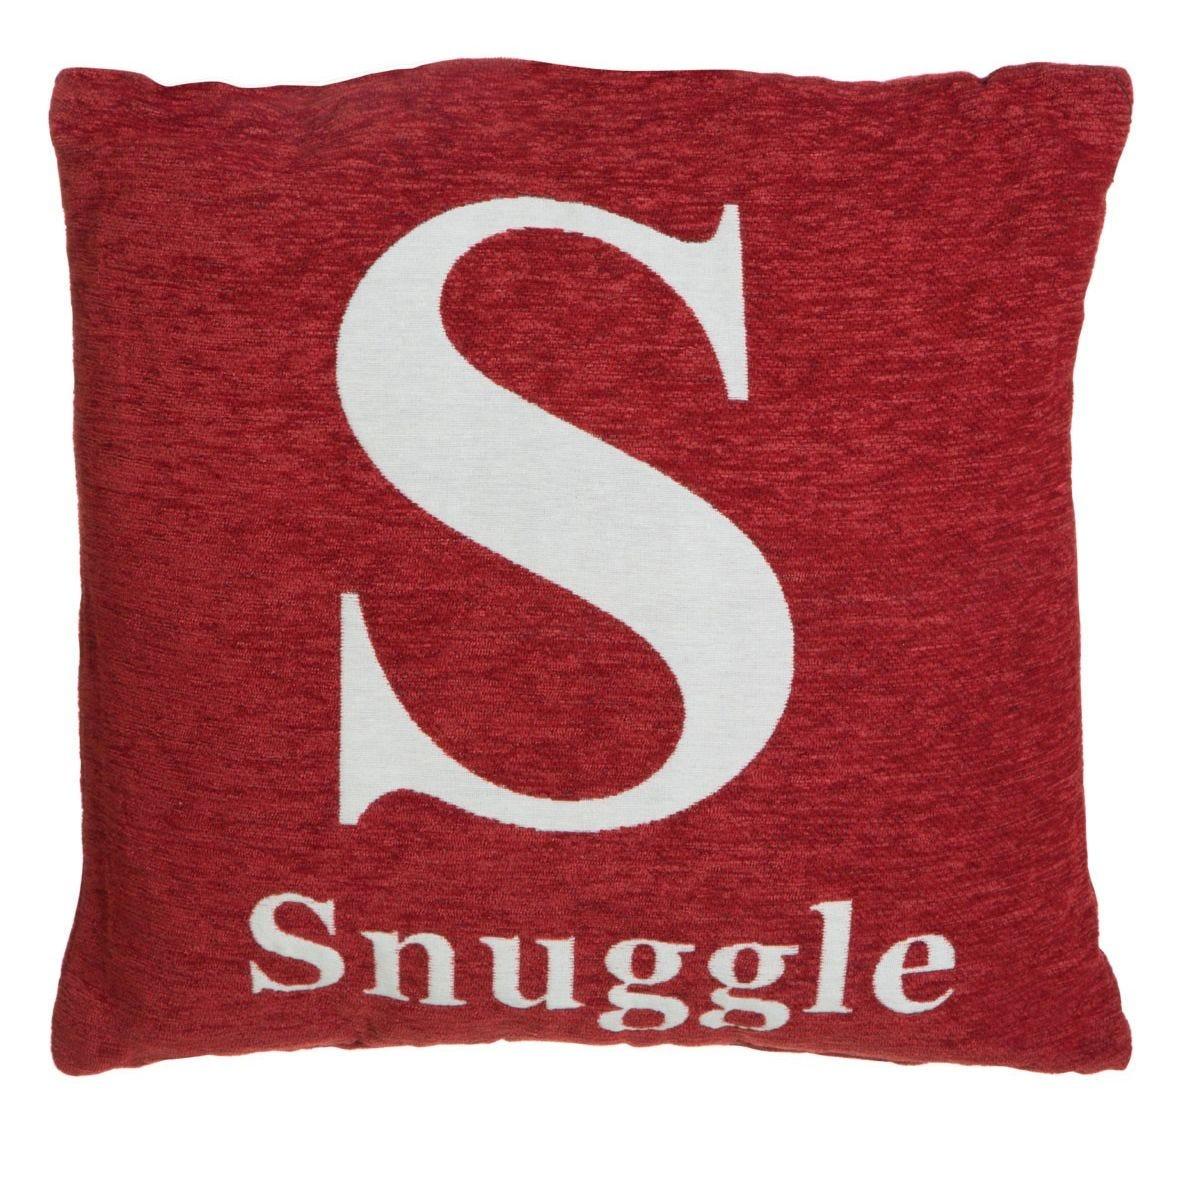 Premier Housewares 'Snuggle' Cushion - Red